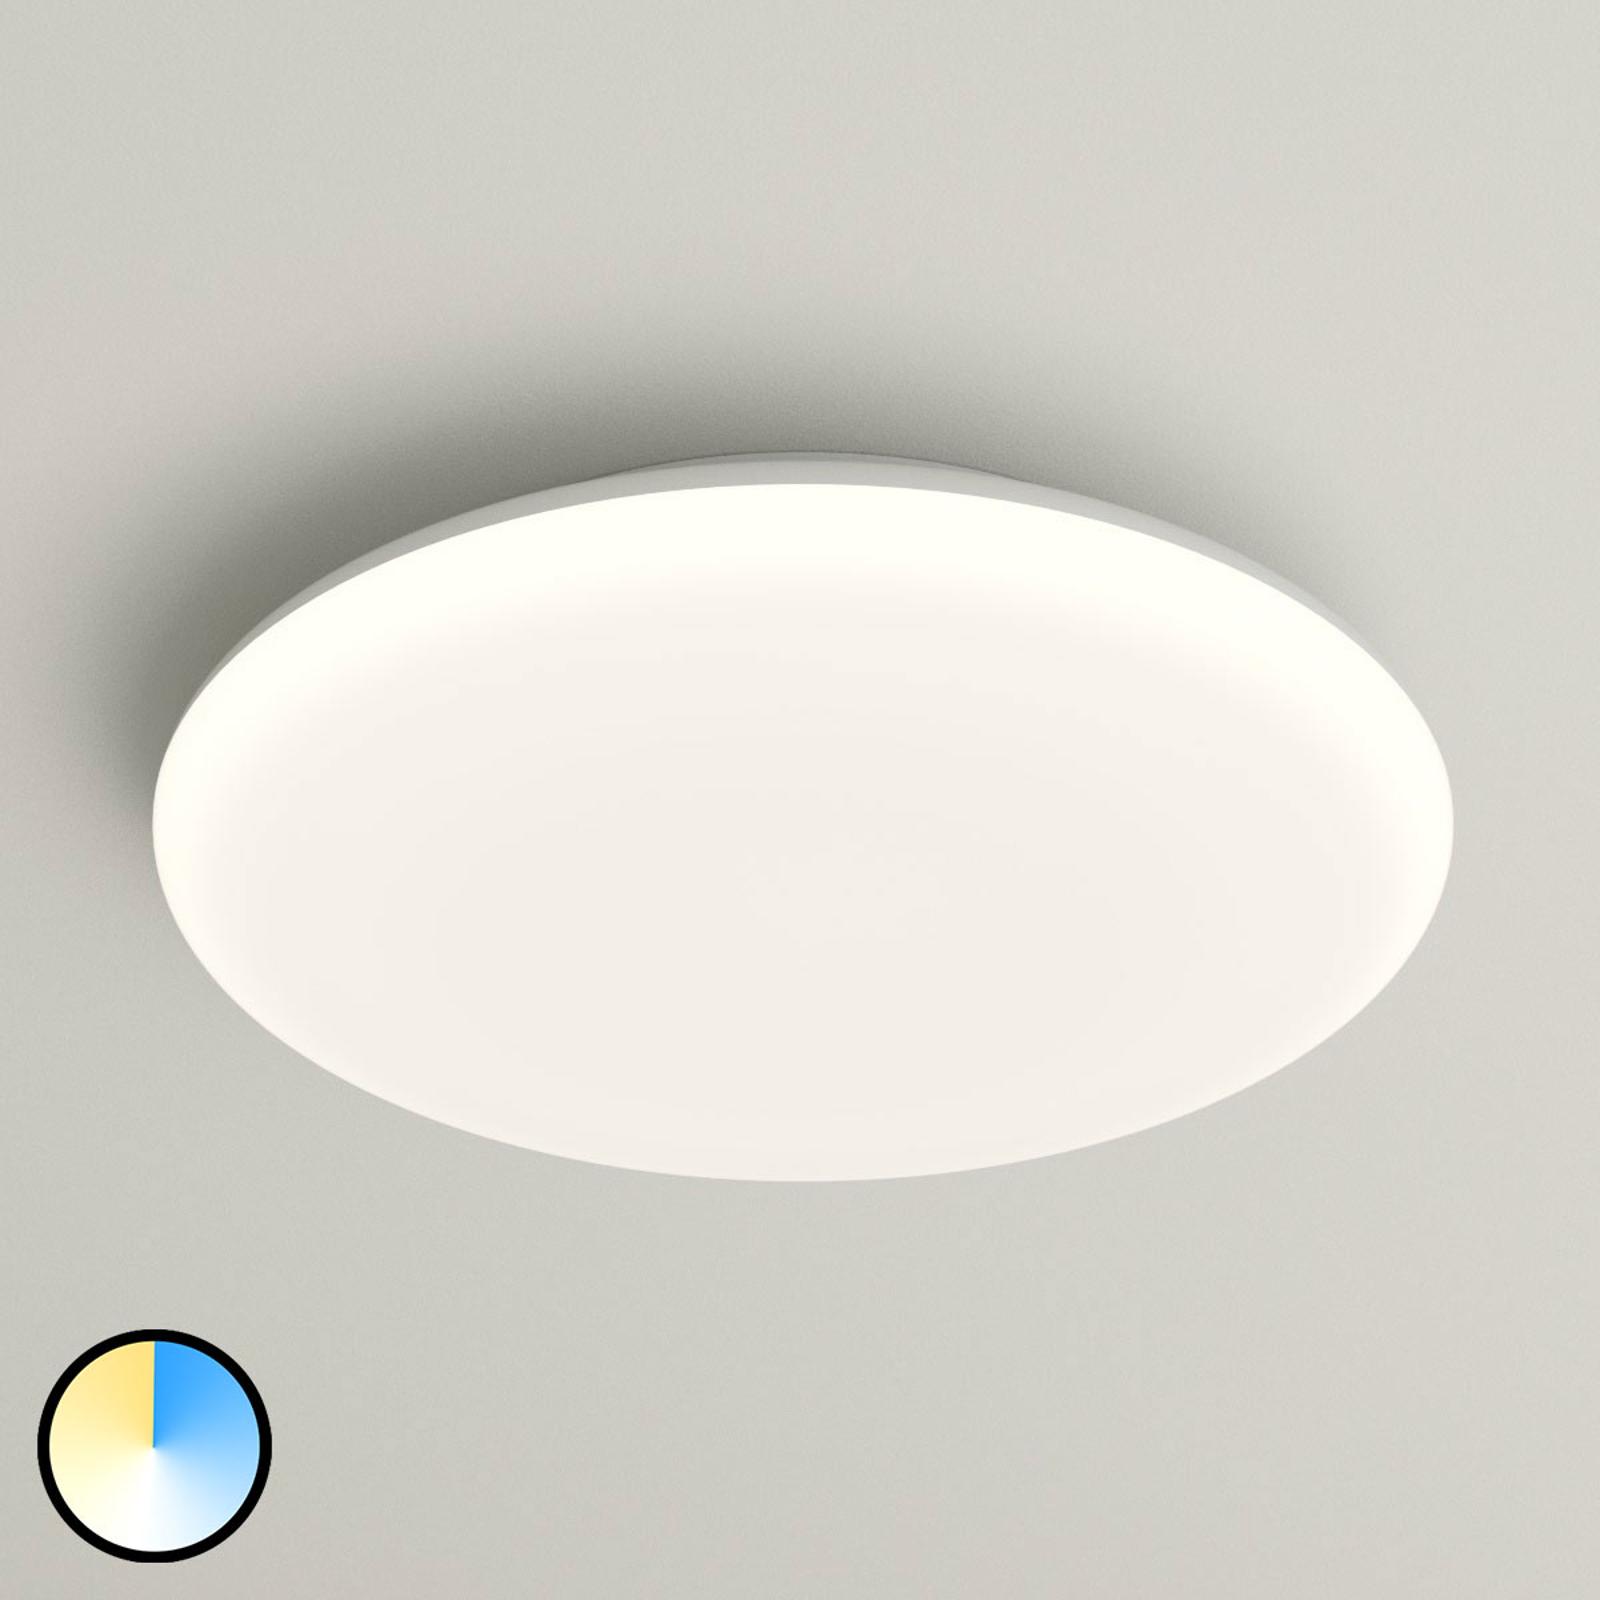 LED plafondlamp Azra, wit, rond, IP54, Ø 30 cm